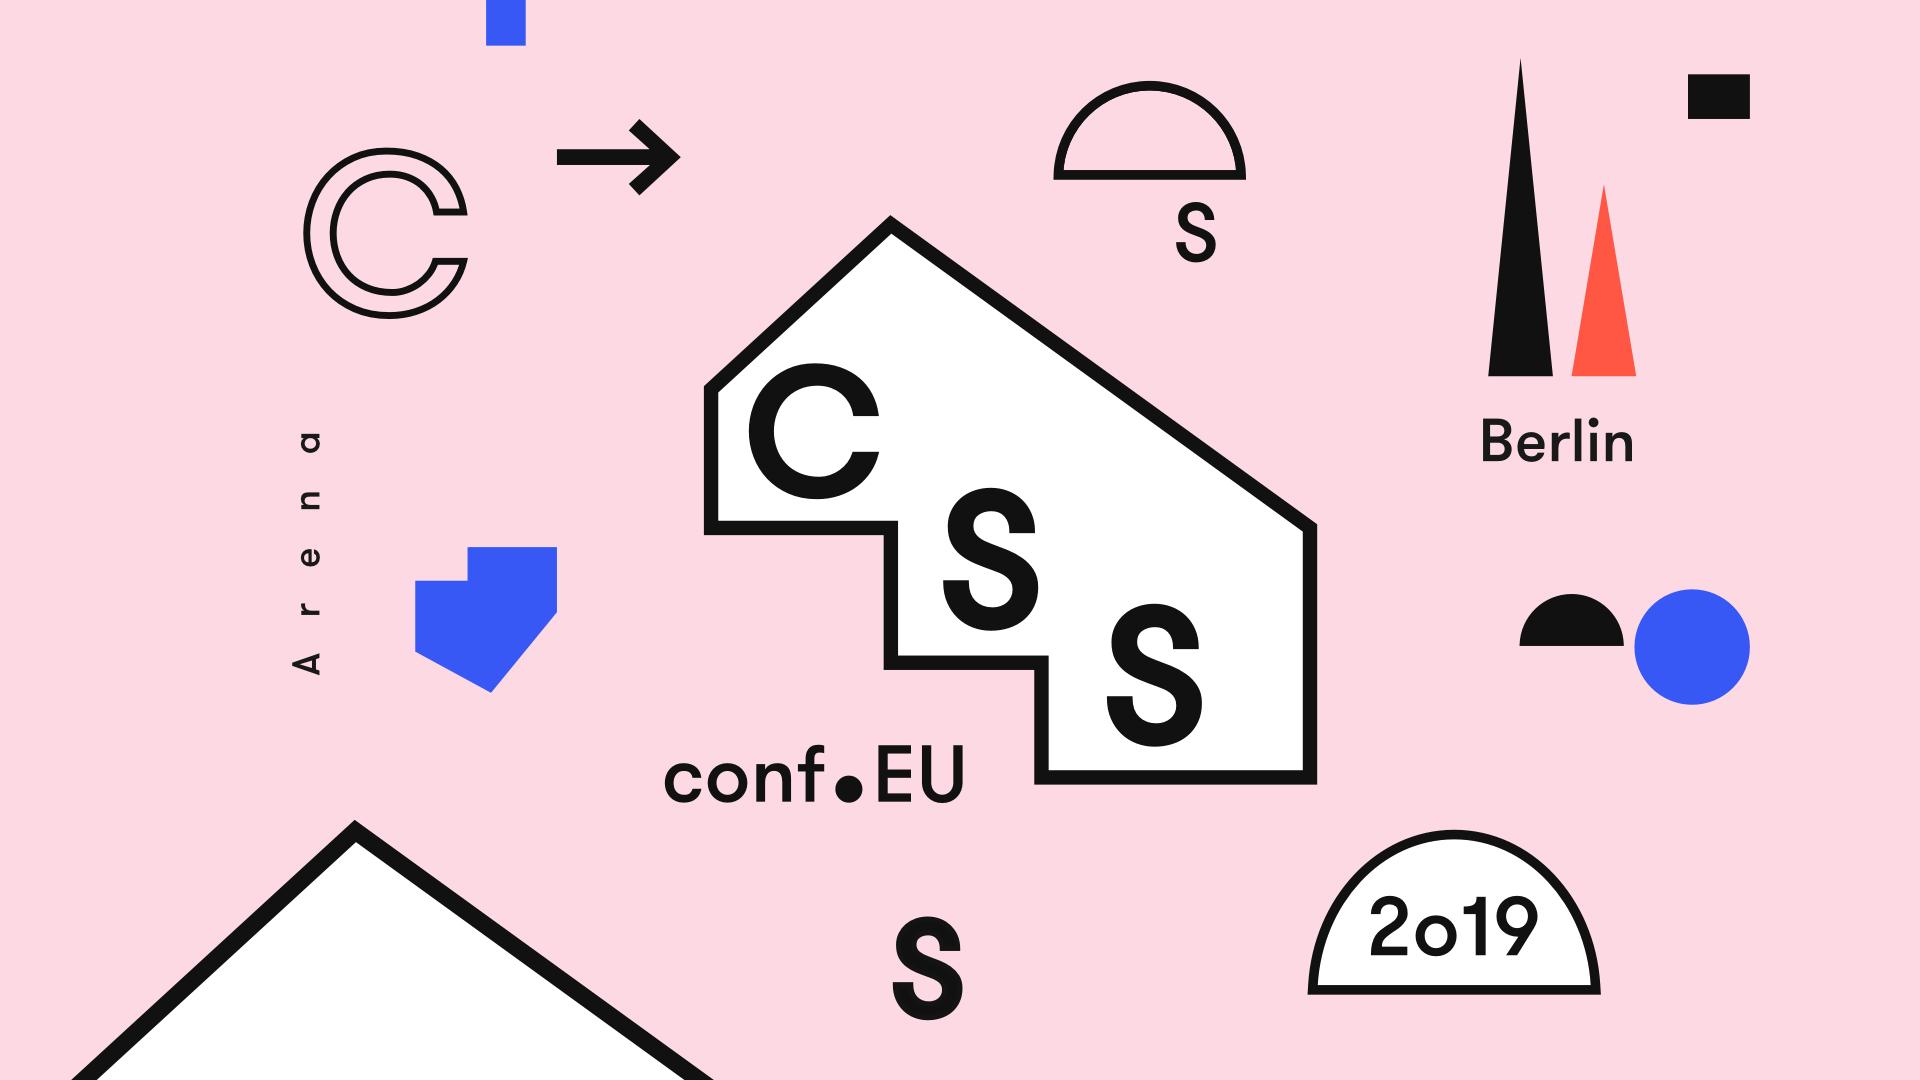 CSS Conf 2019 Berlin